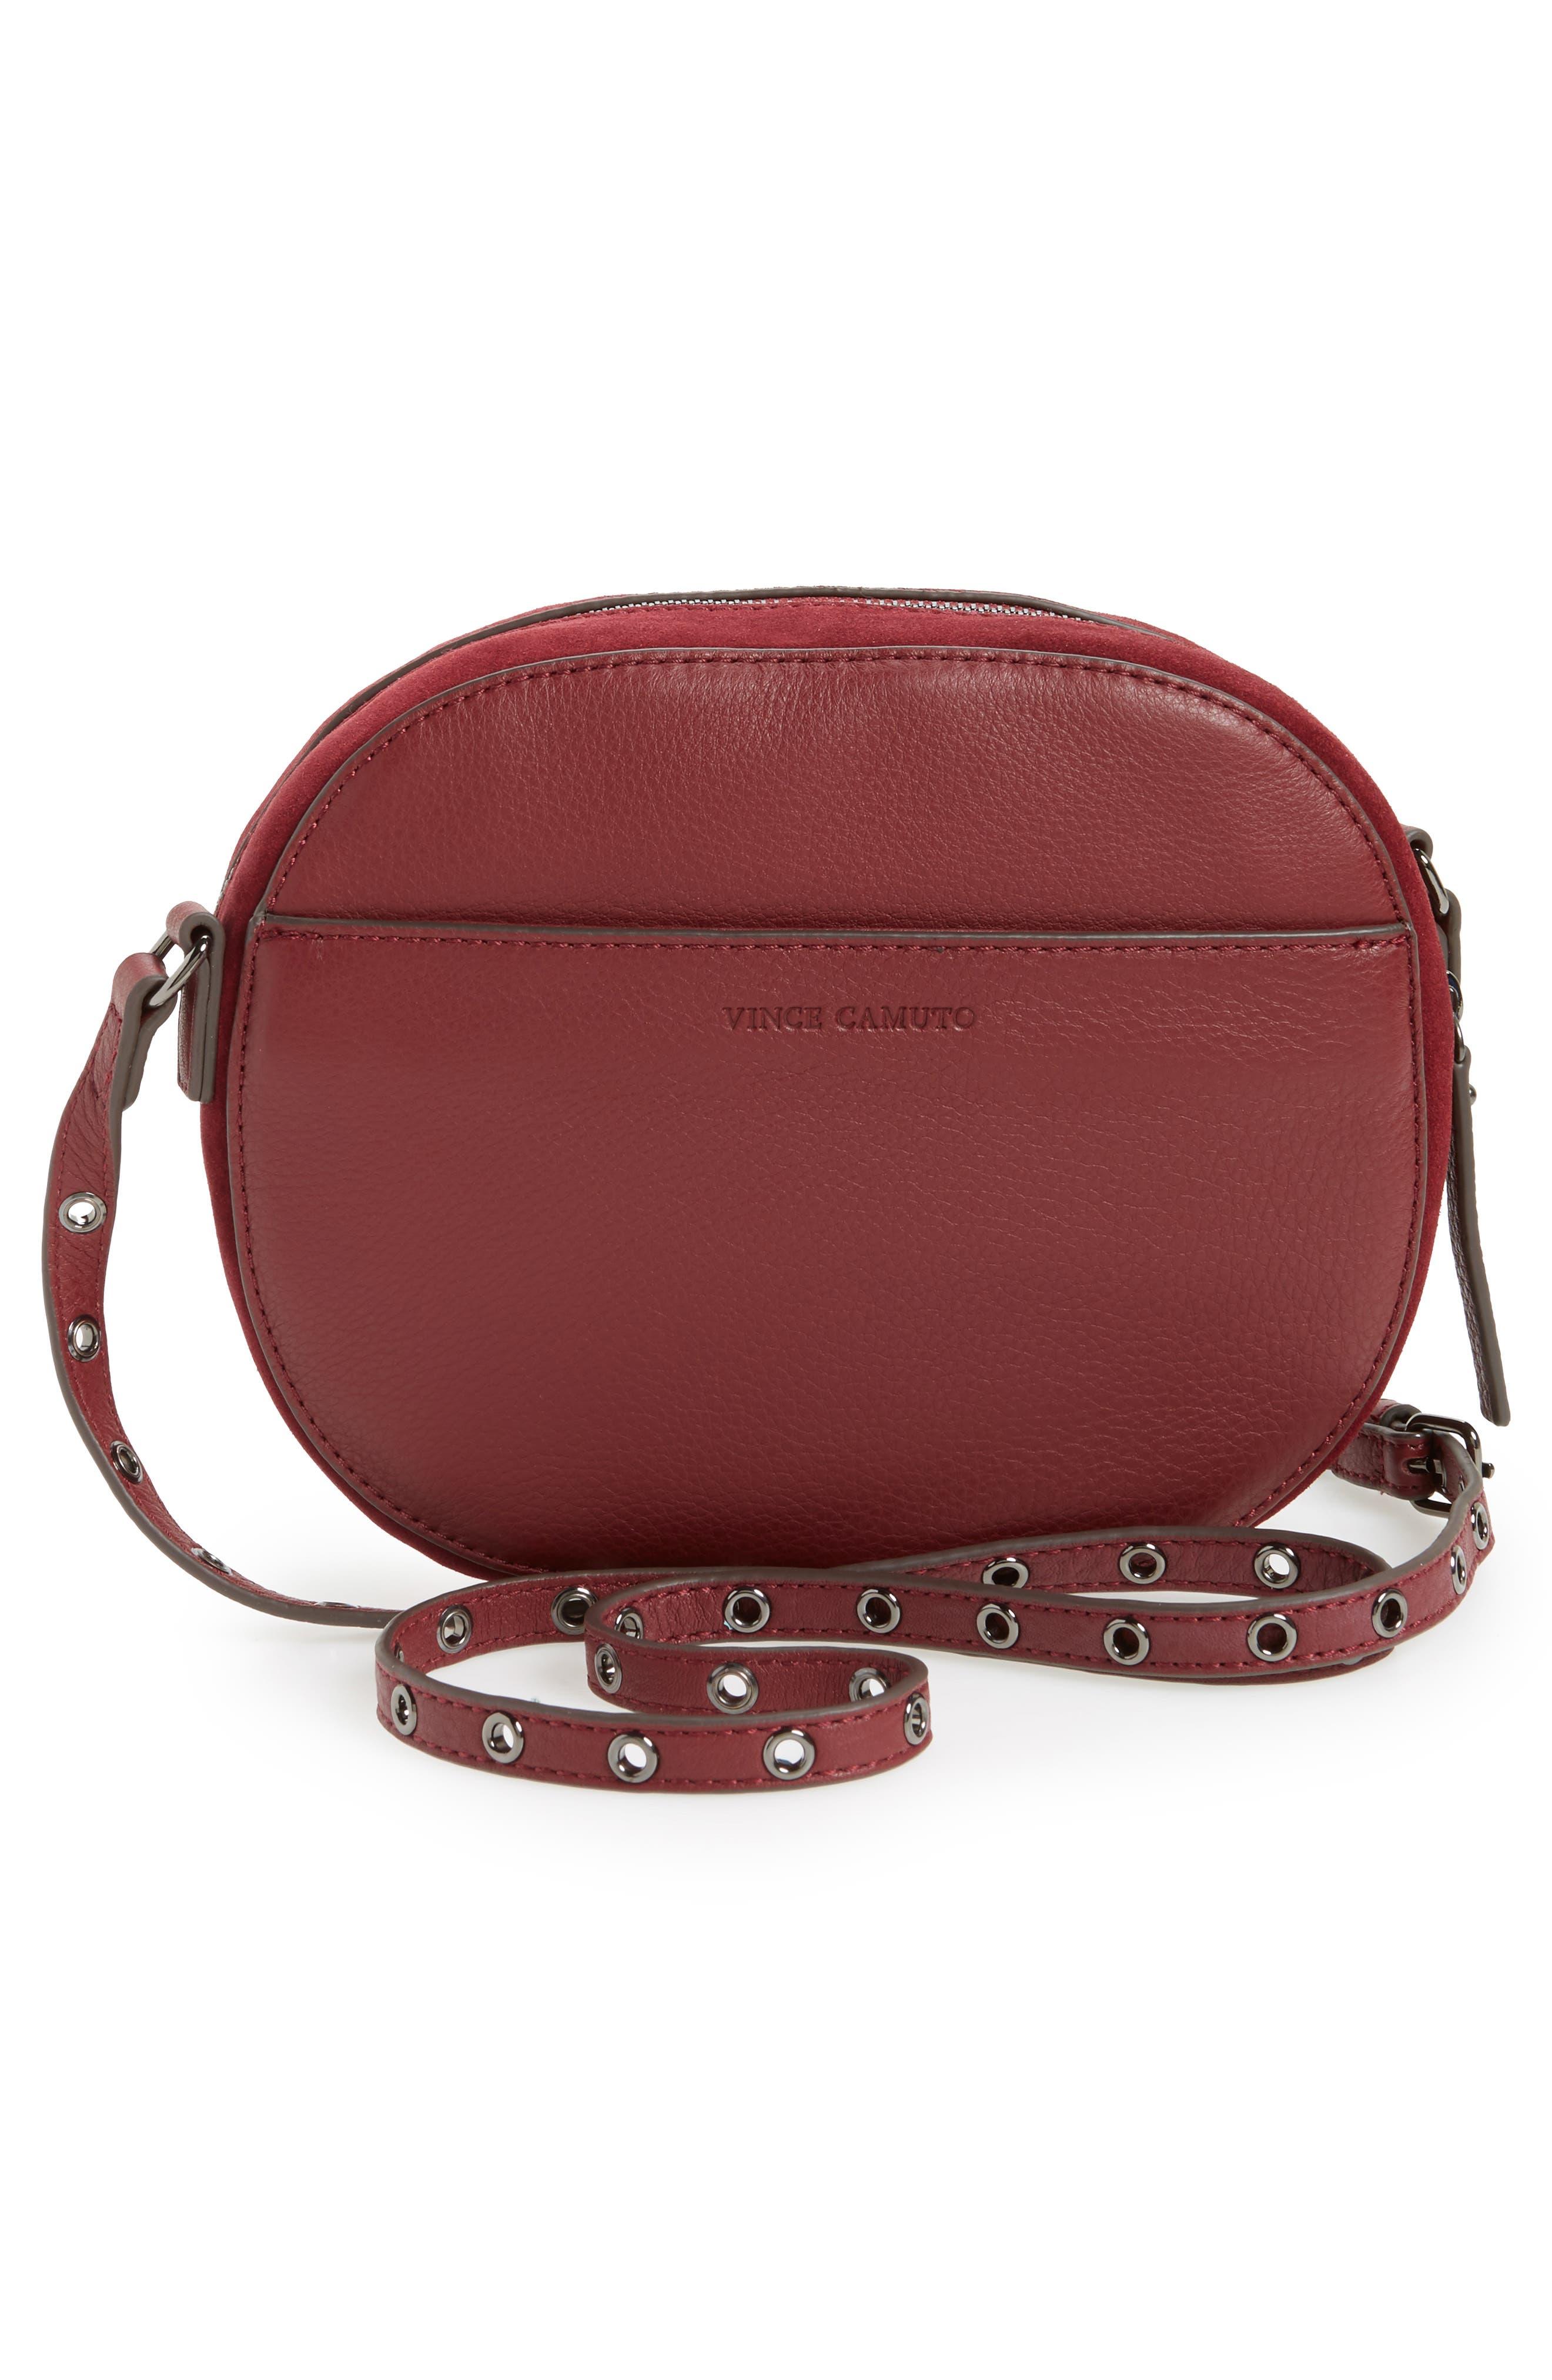 Alternate Image 2  - Vince Camuto Areli Suede & Leather Crossbody Bag